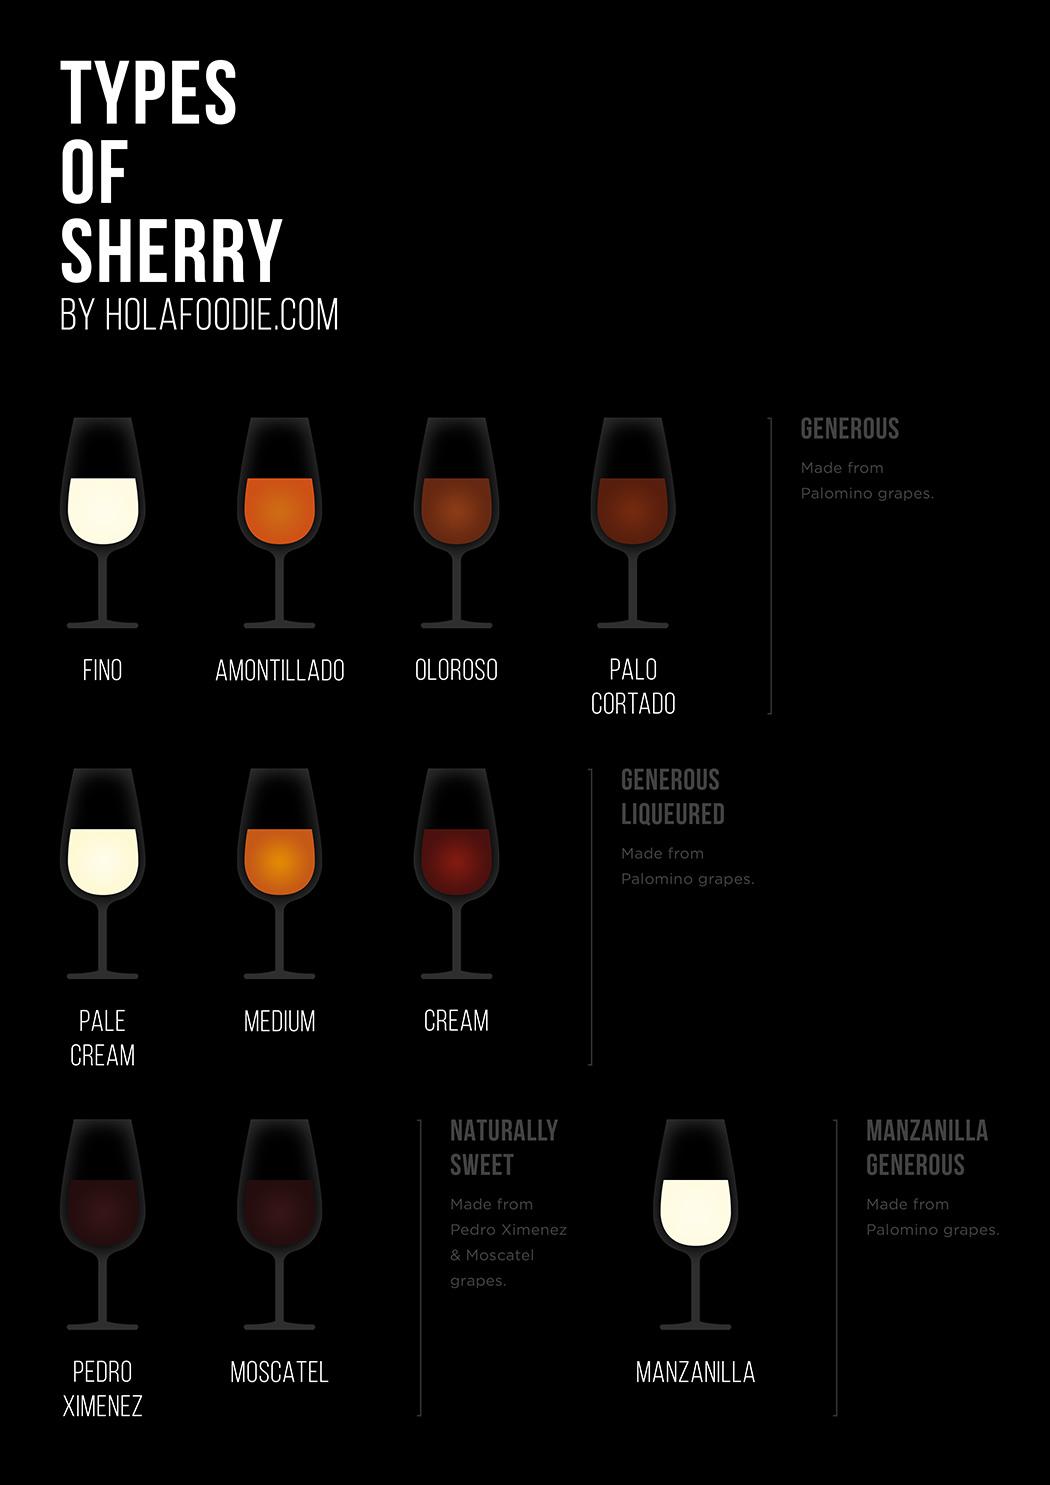 Sherry types